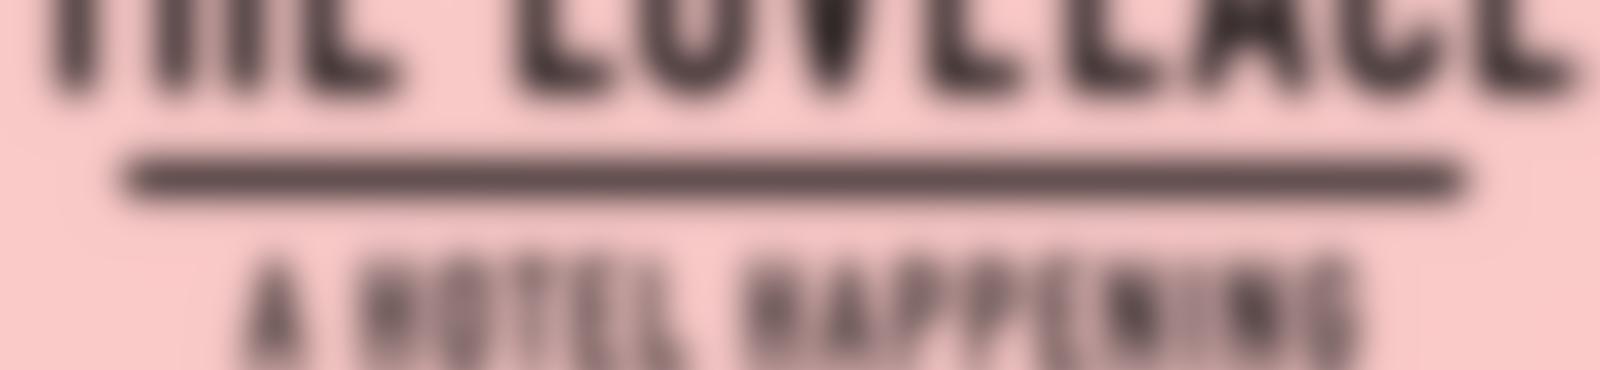 Blurred 3d13ec75 91d4 4f9e a988 b23df8623fc6